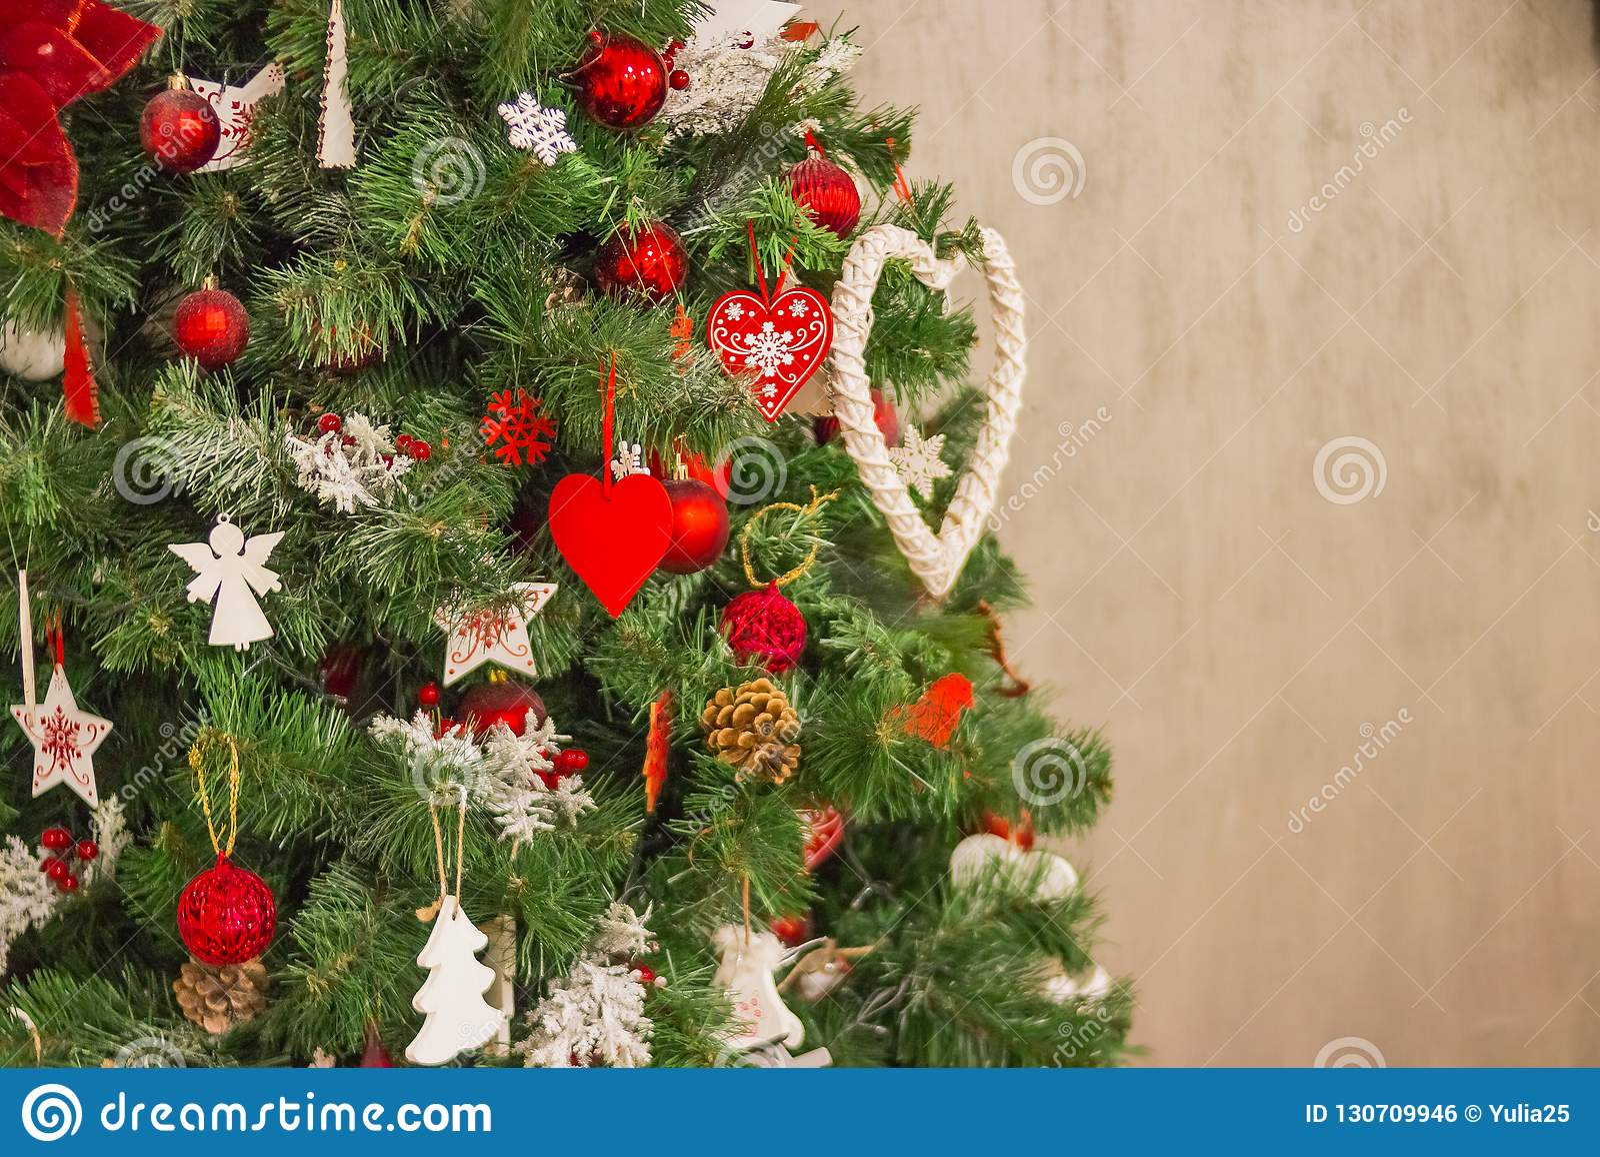 Hanging Christmas Decorations Wall.Christmas Tree Over Beige Wall Colorful Christmas